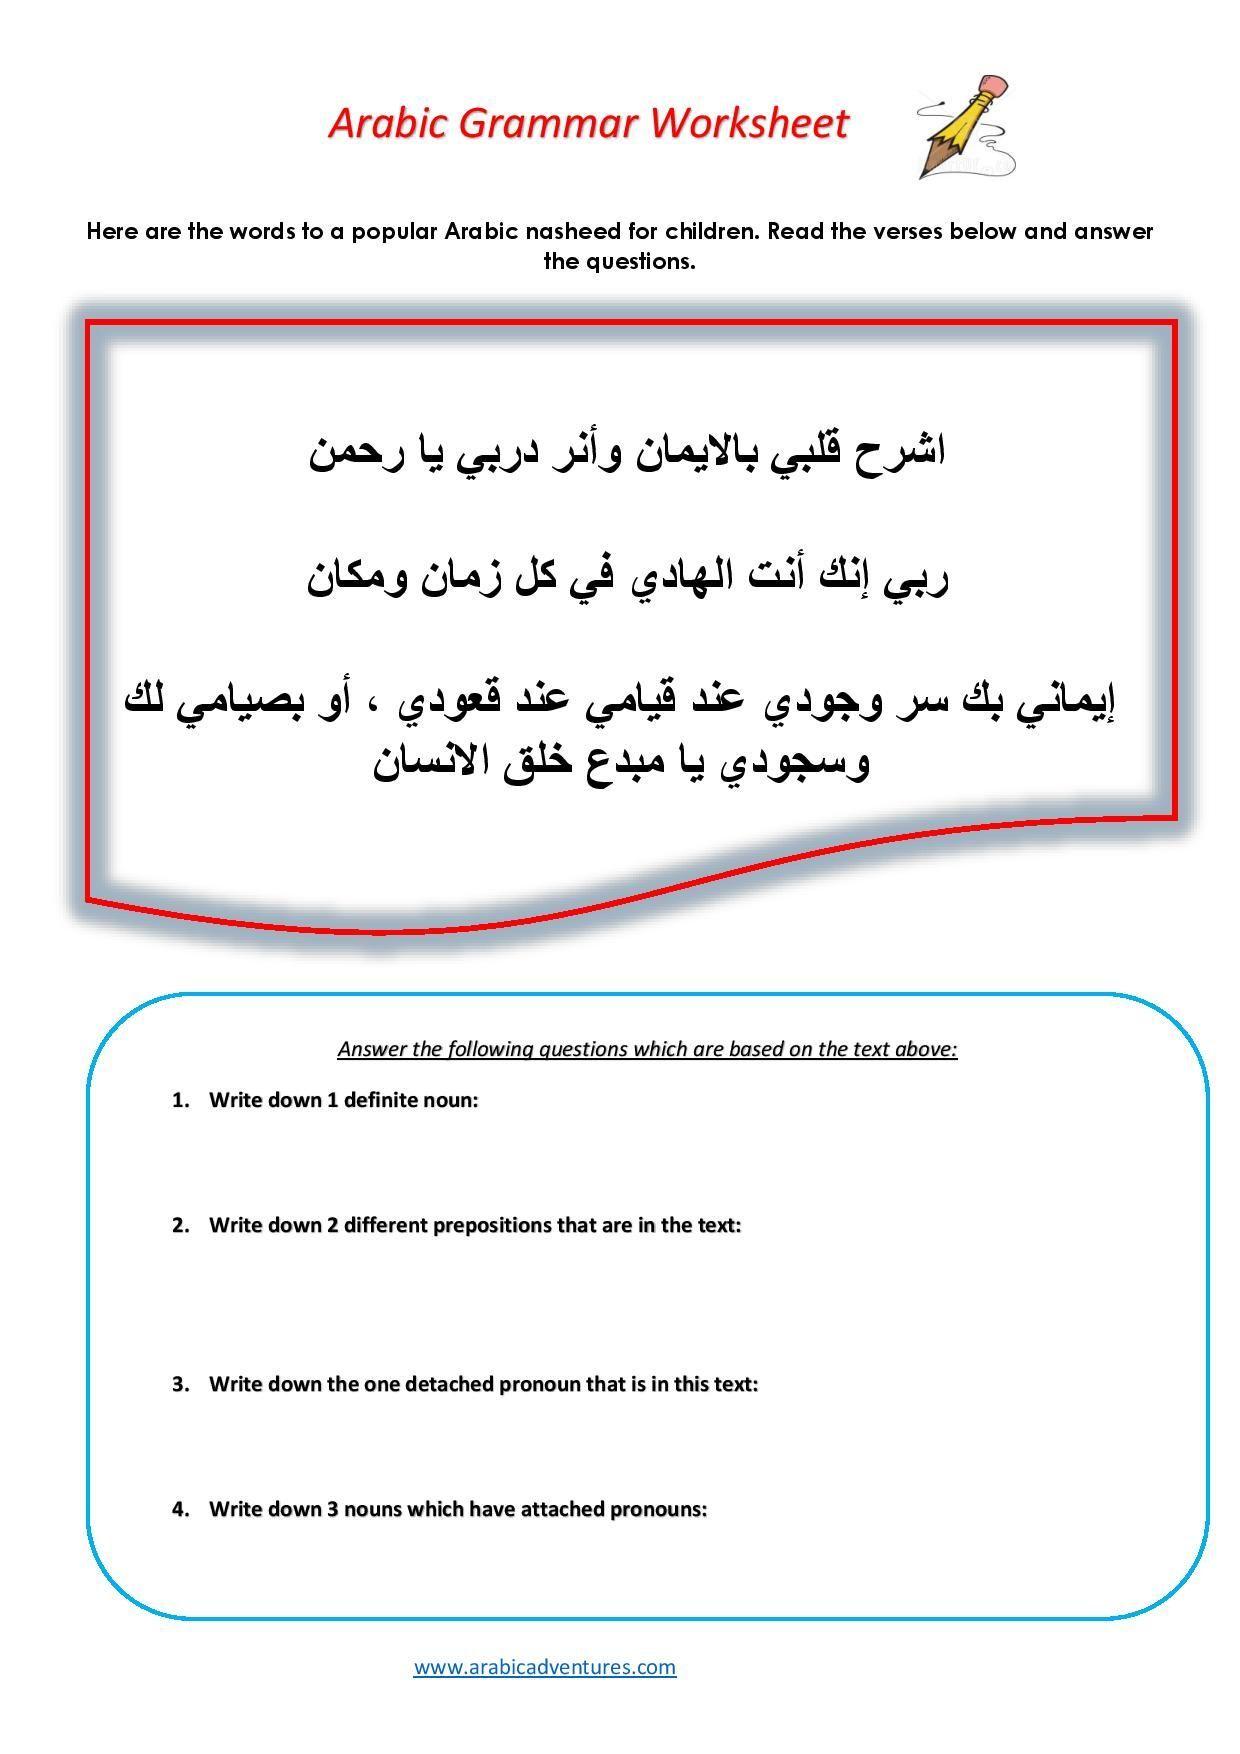 Arabic Grammar Review Worksheet Using A Popular Nasheed For Children